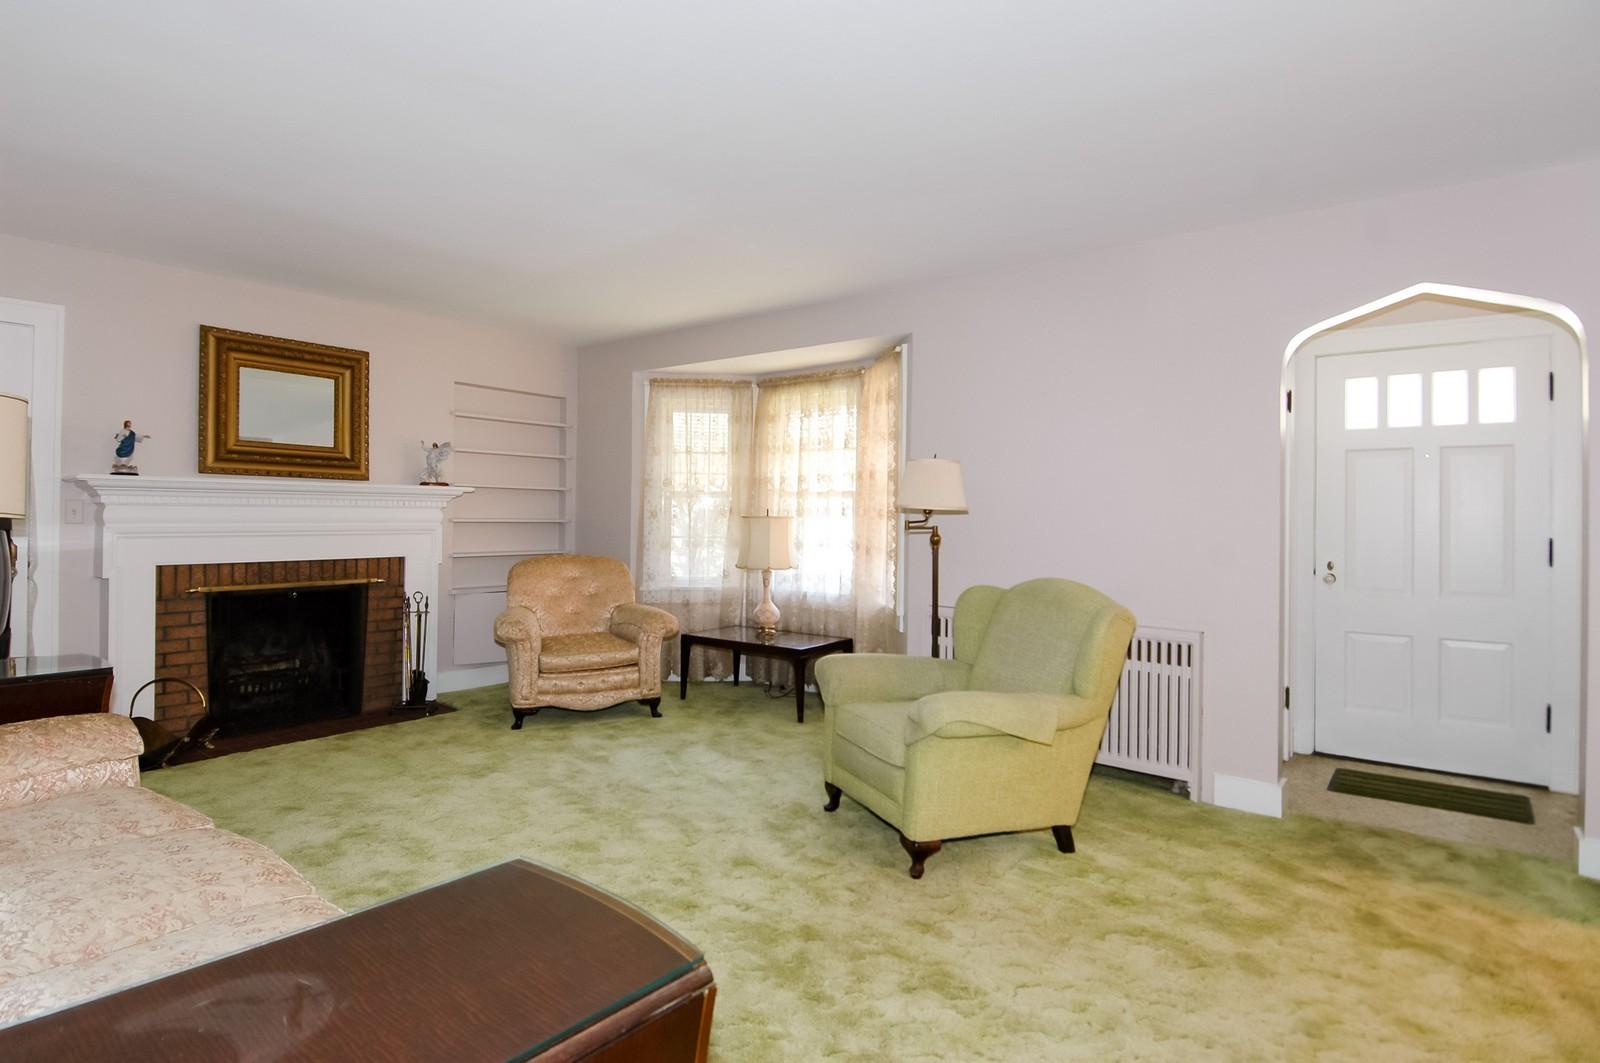 Real Estate Photography - 302 Washington, Algonquin, IL, 60102 - Living Room